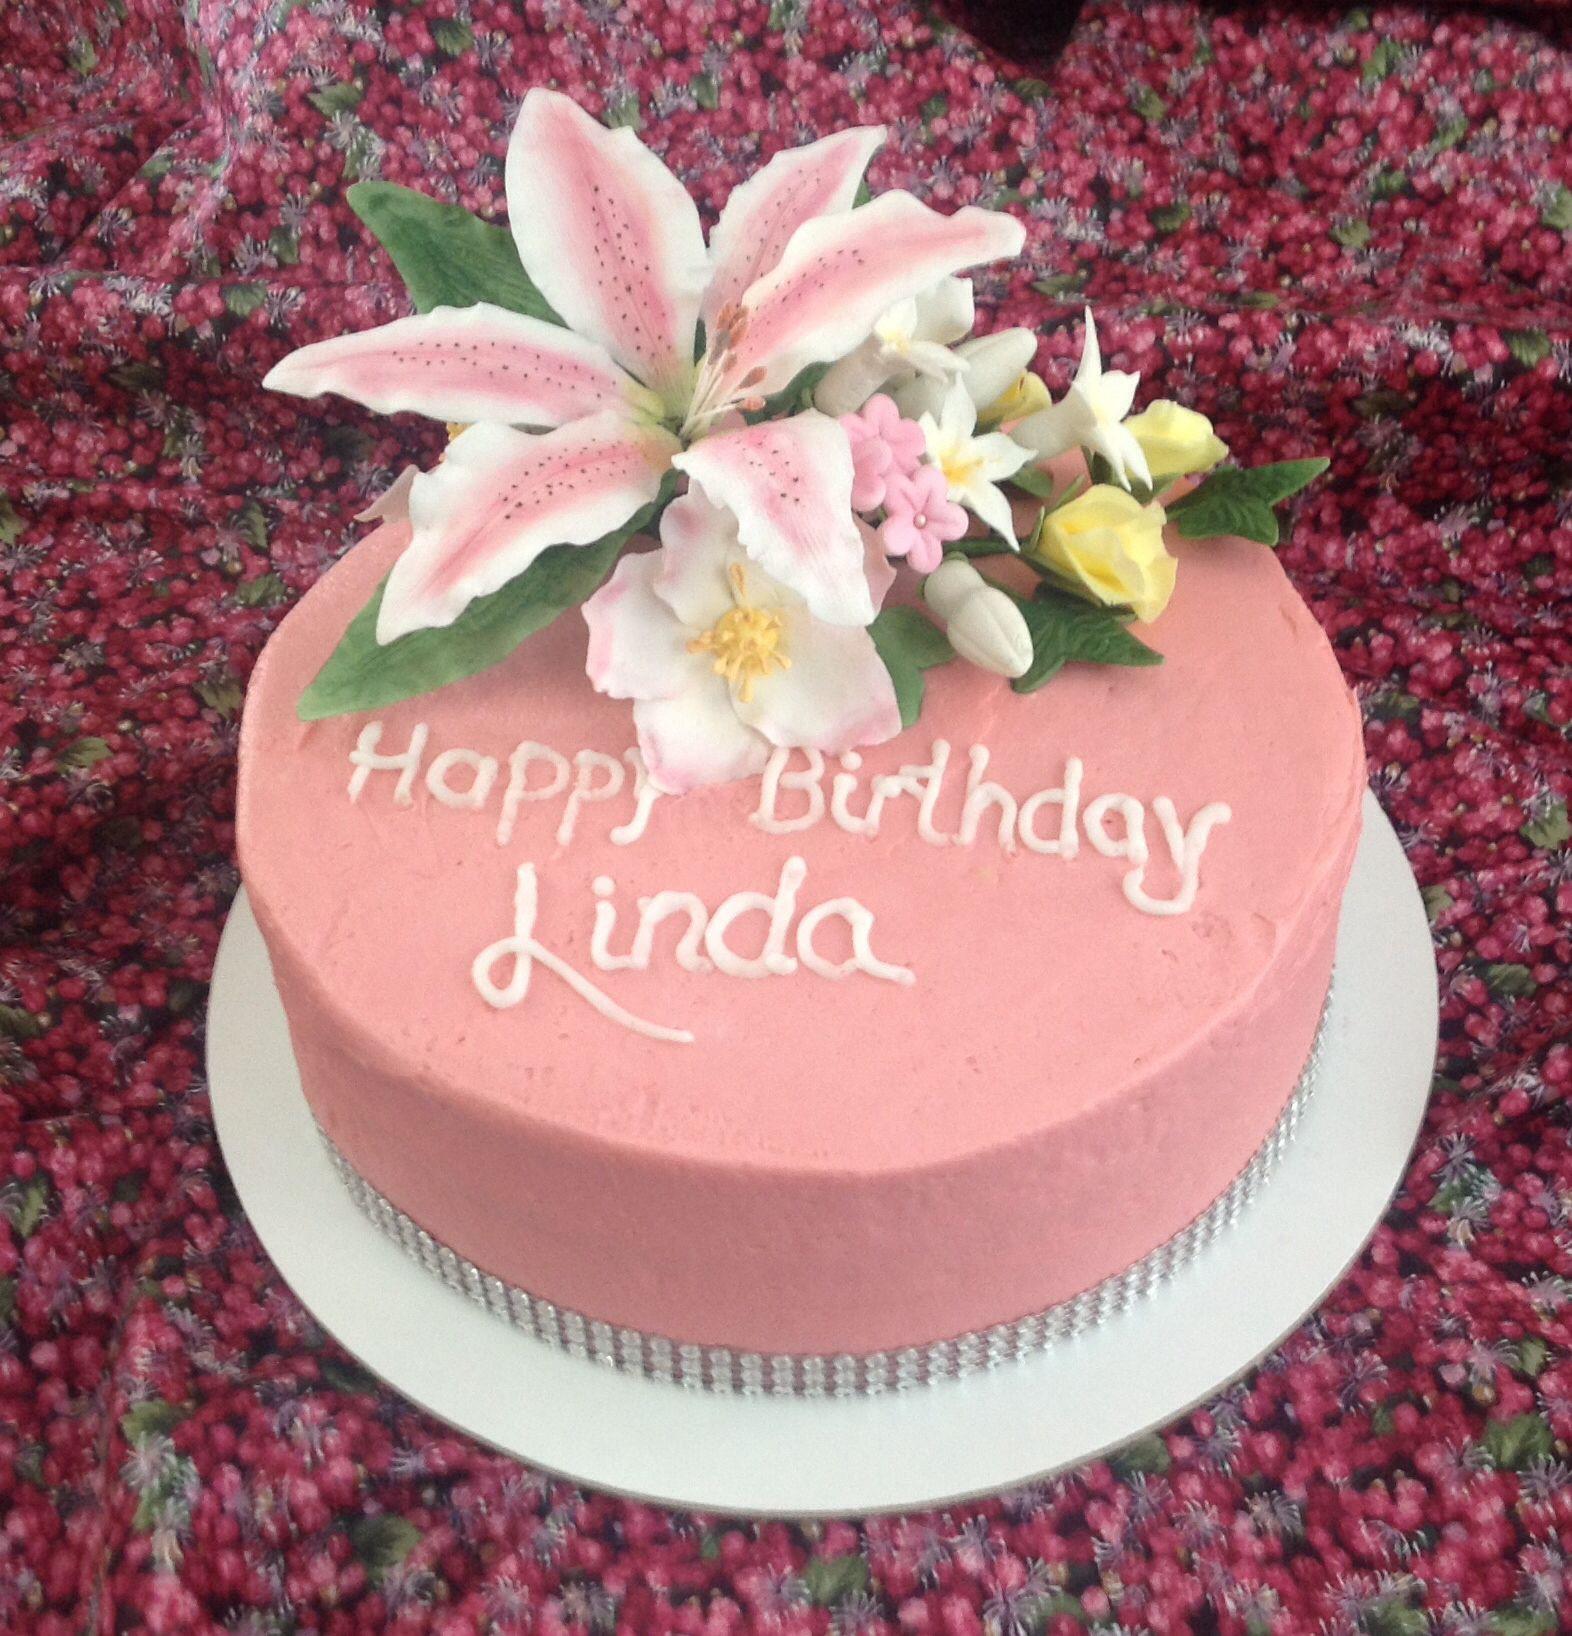 Best ideas about Happy Birthday Linda Cake . Save or Pin Happy Birthday Linda flower & paper crafting Now.